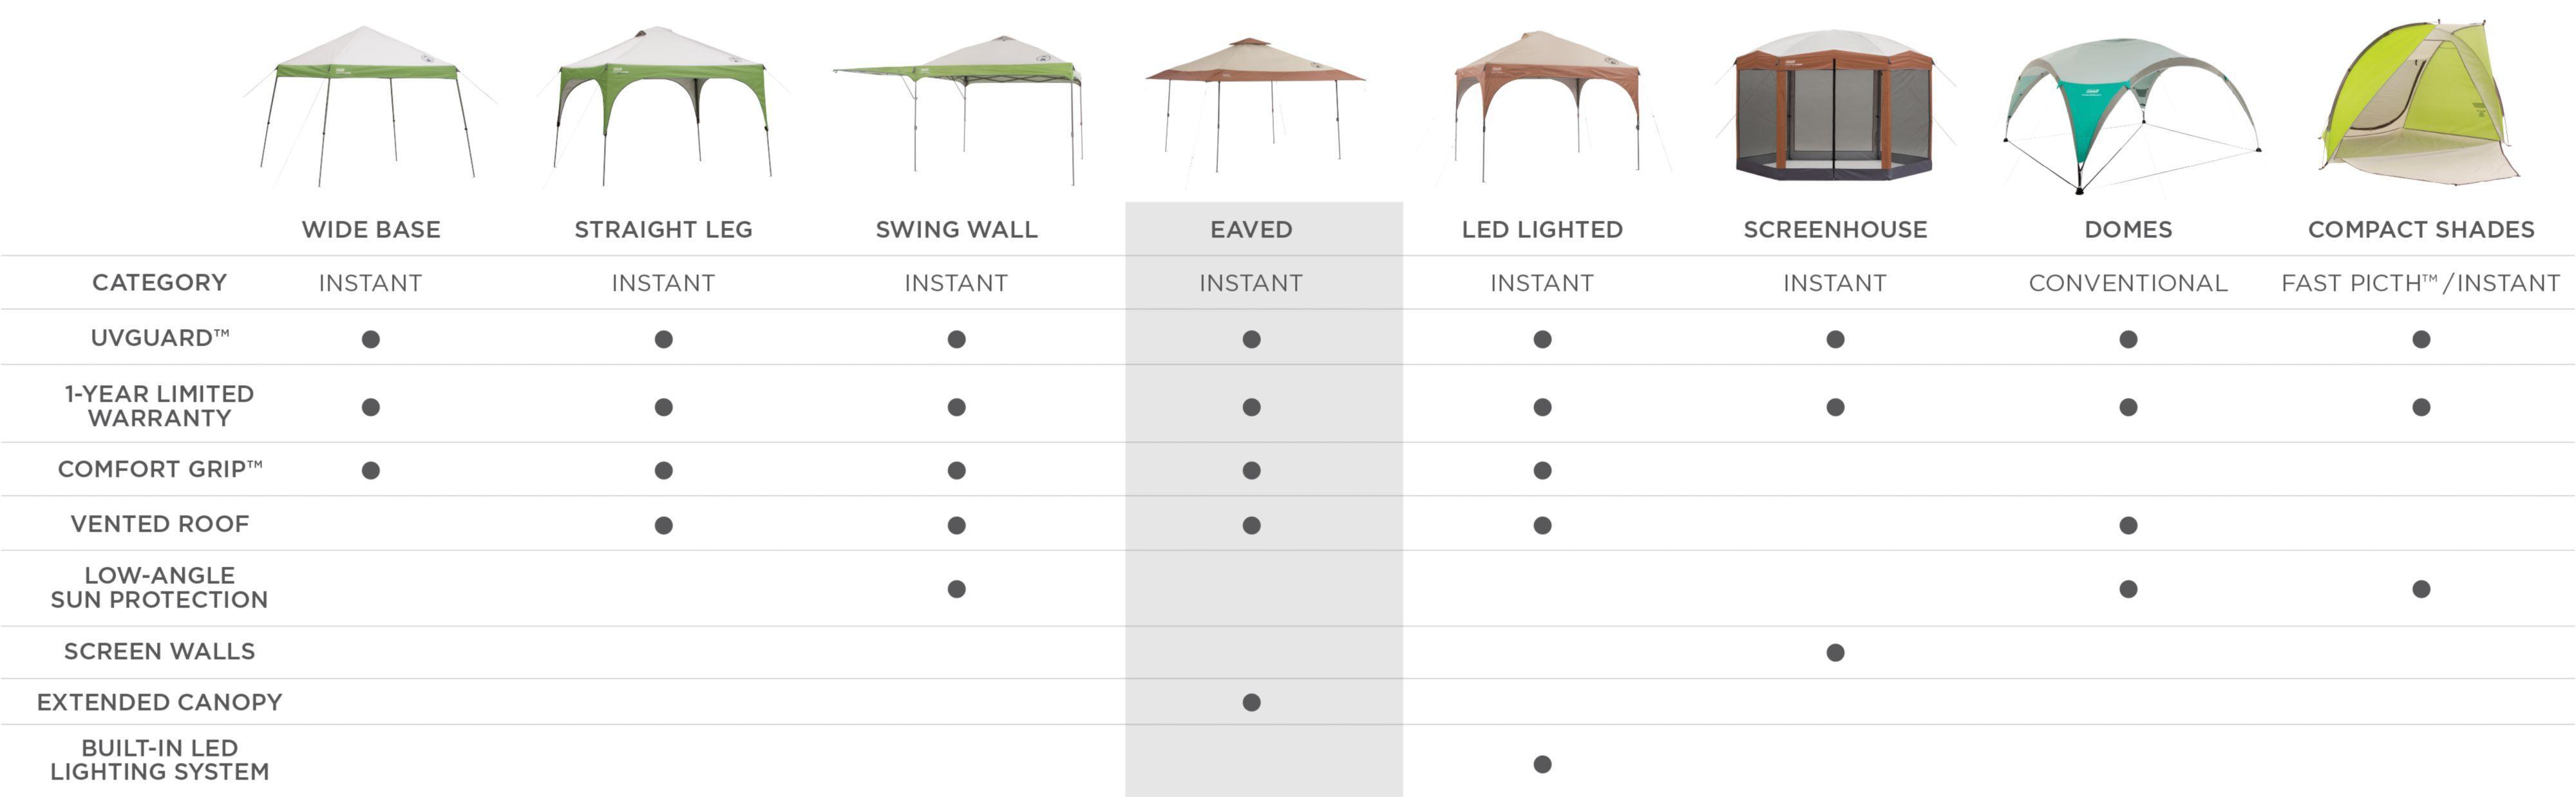 Read more  sc 1 st  Amazon.com & Amazon.com : Coleman 2000004407 Instant Beach Canopy 13 x 13 Feet ...